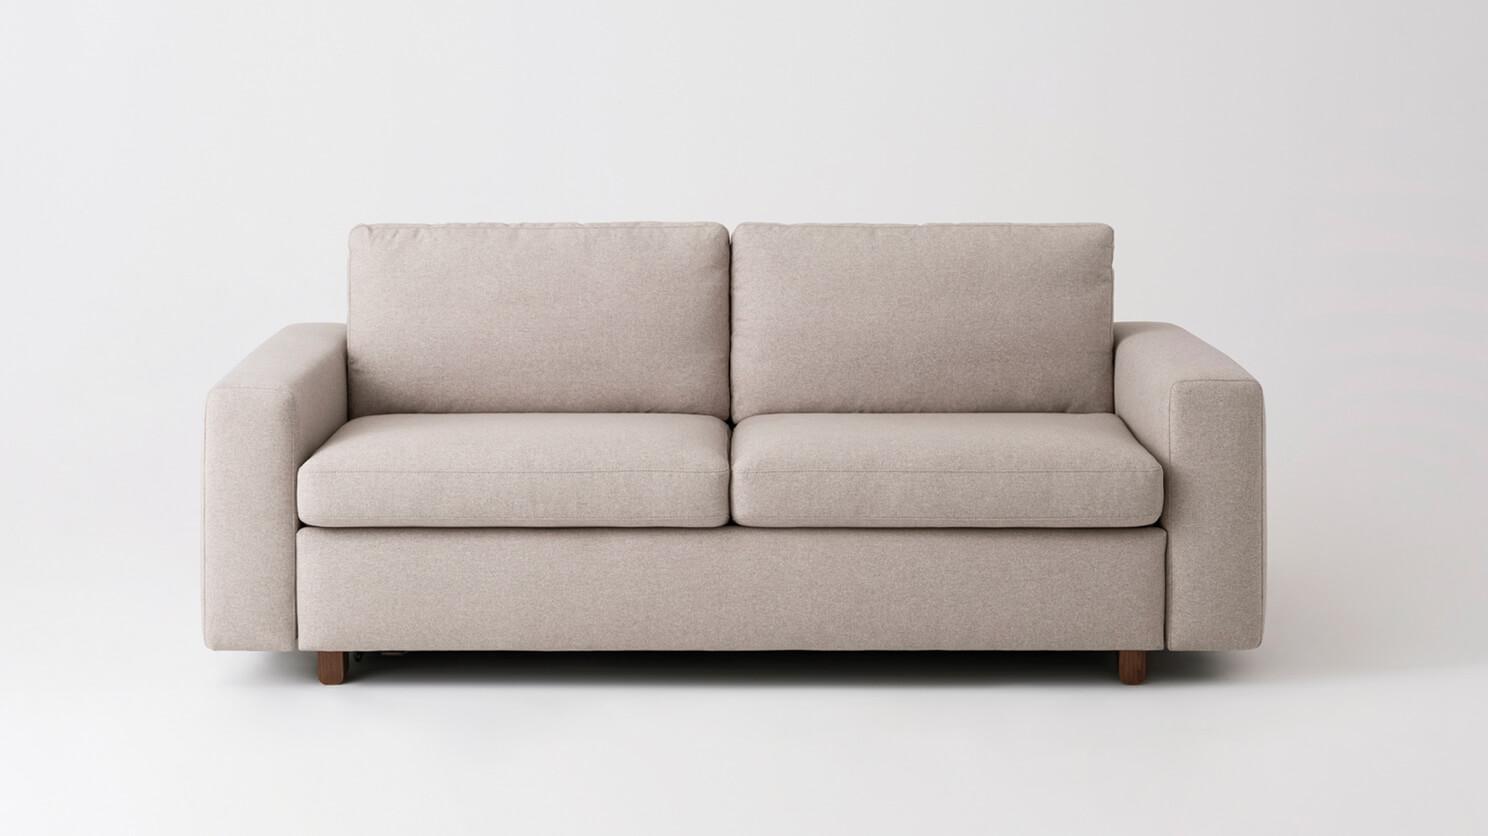 reva sleeper sofa fabric double sofa bed fabric hy326 black sand arm fabric black sand